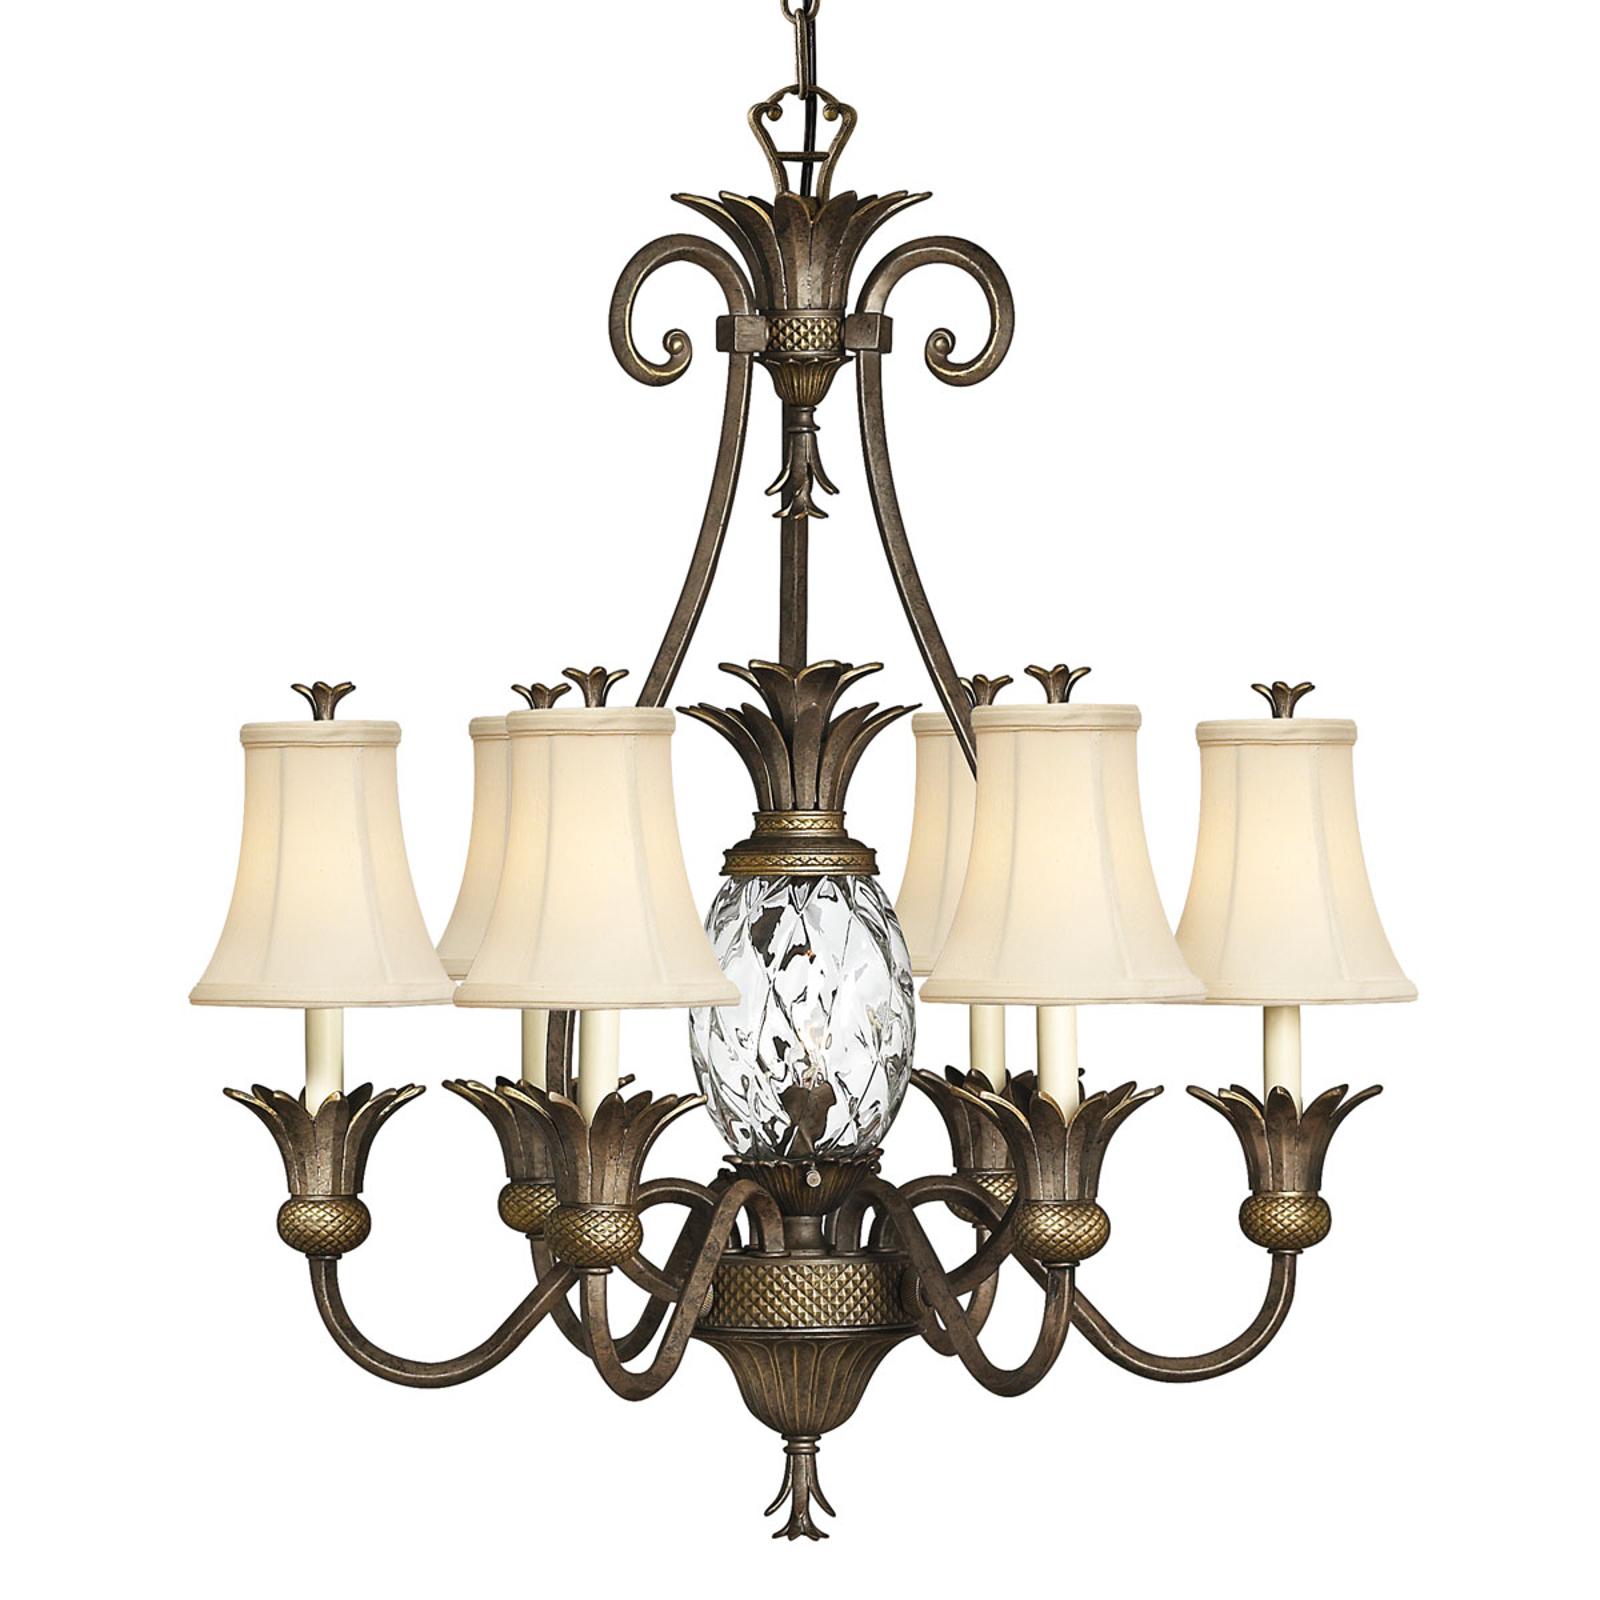 Kroonlamp Plantation met kappen, 6-lamps